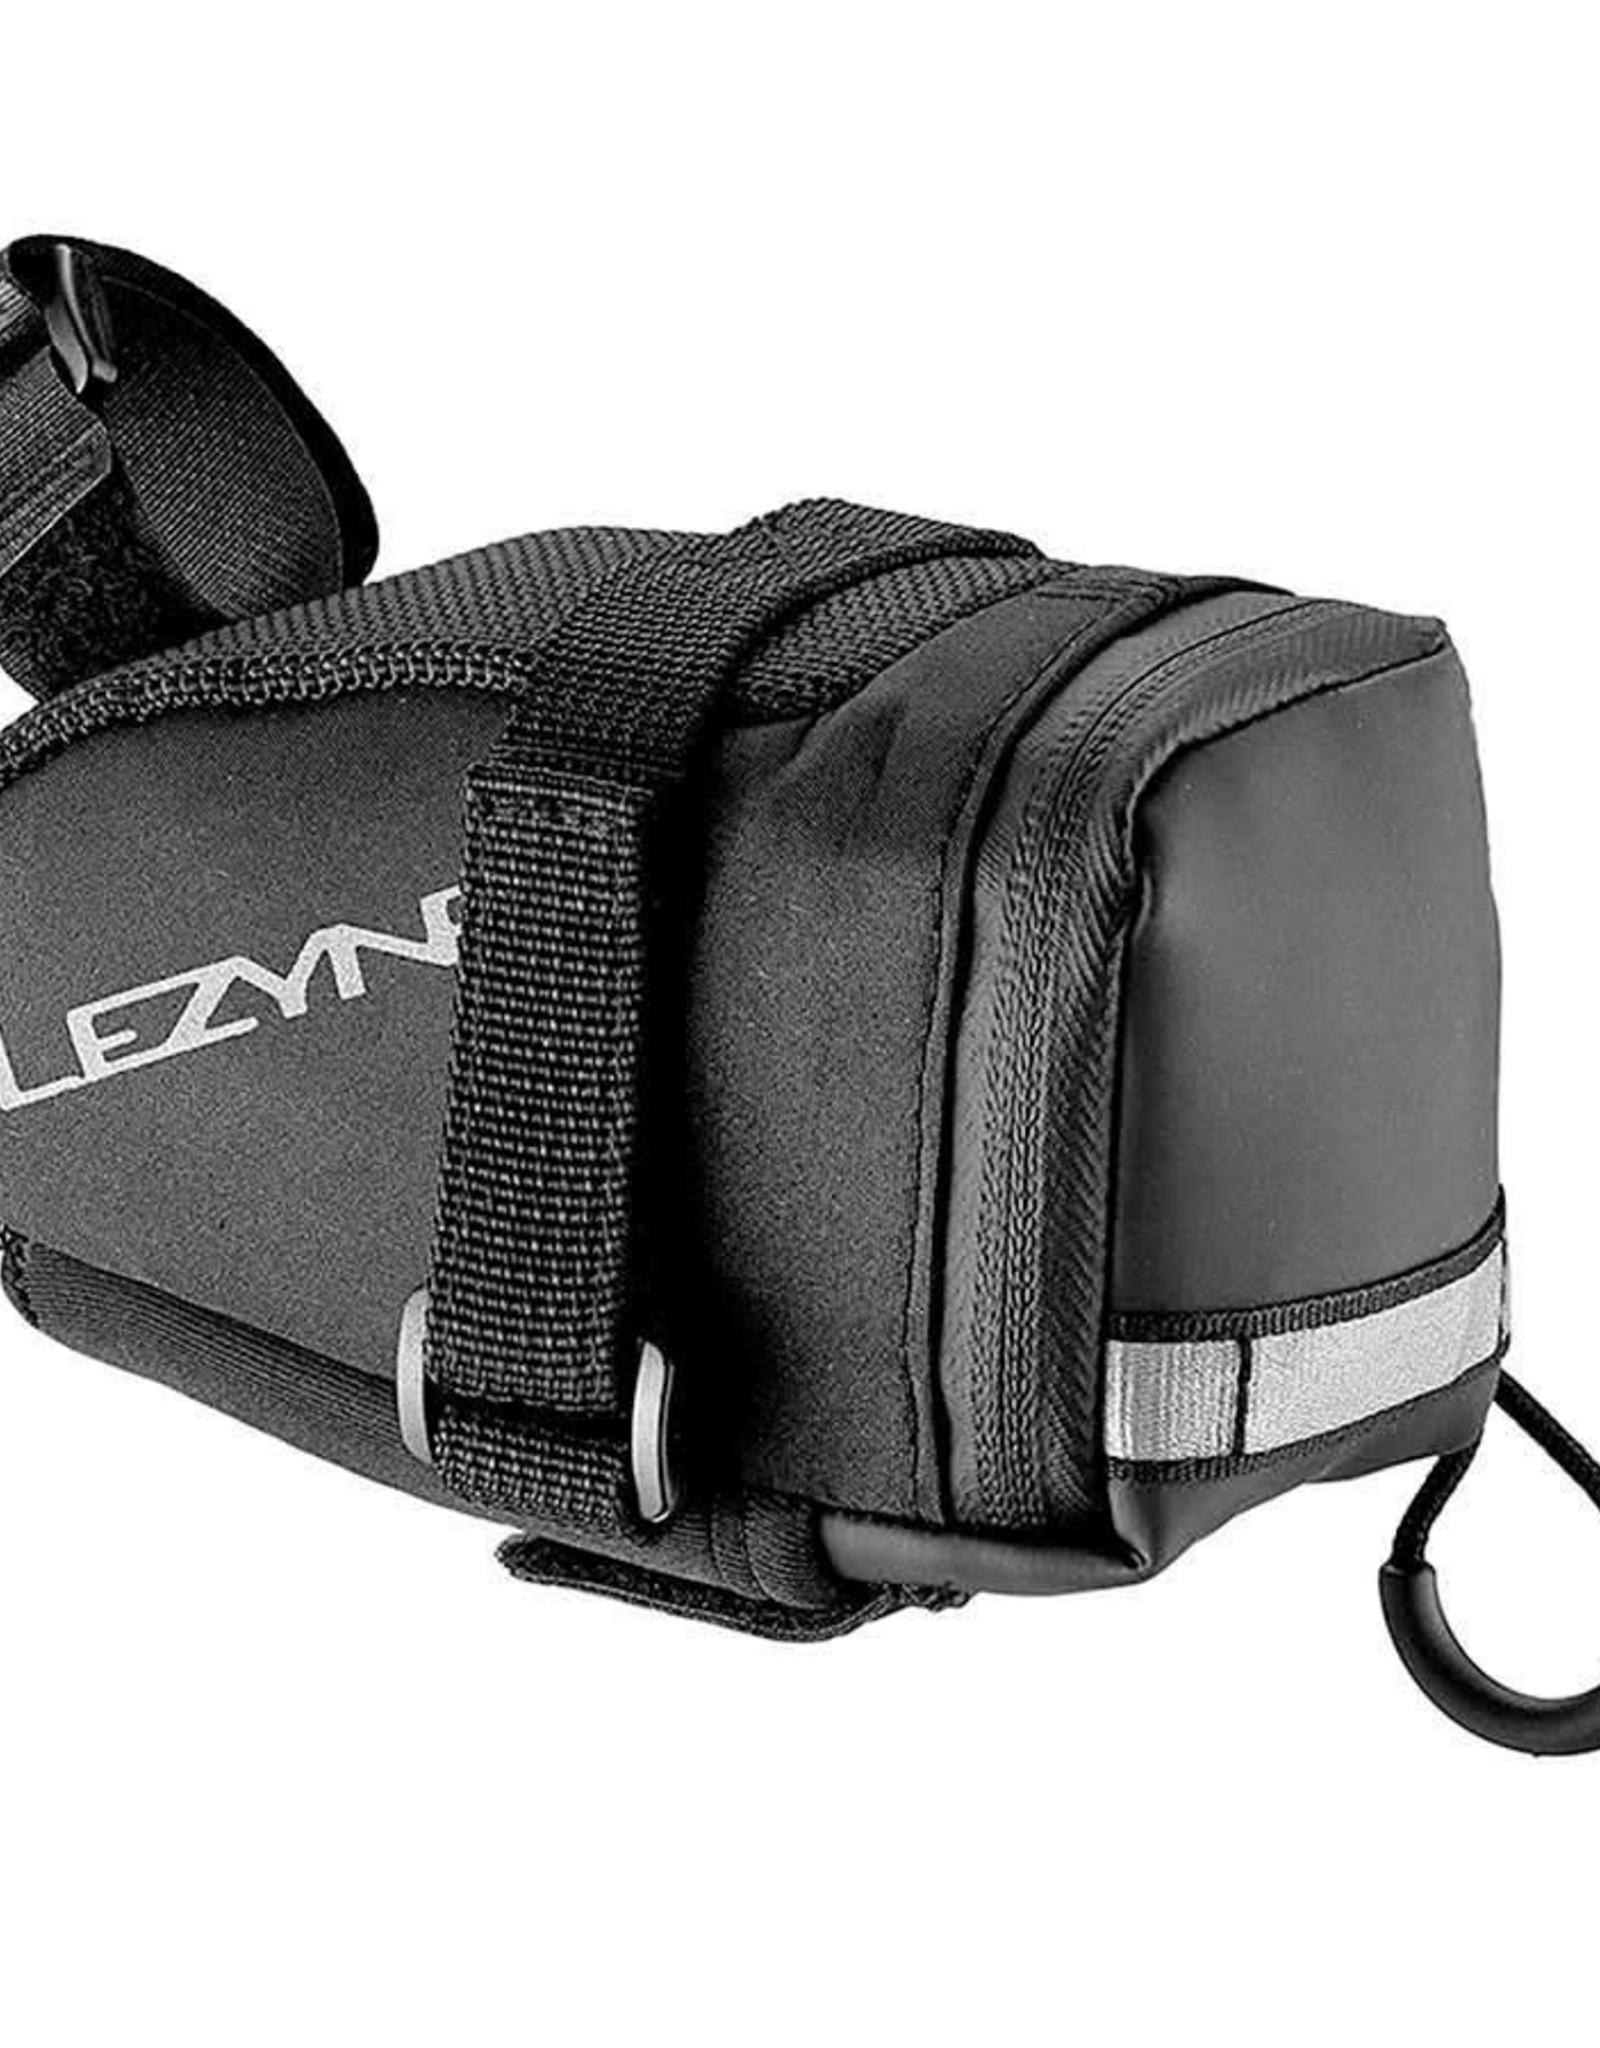 Lezyne Lezyne, L-Caddy, Saddle bag, Black/Black